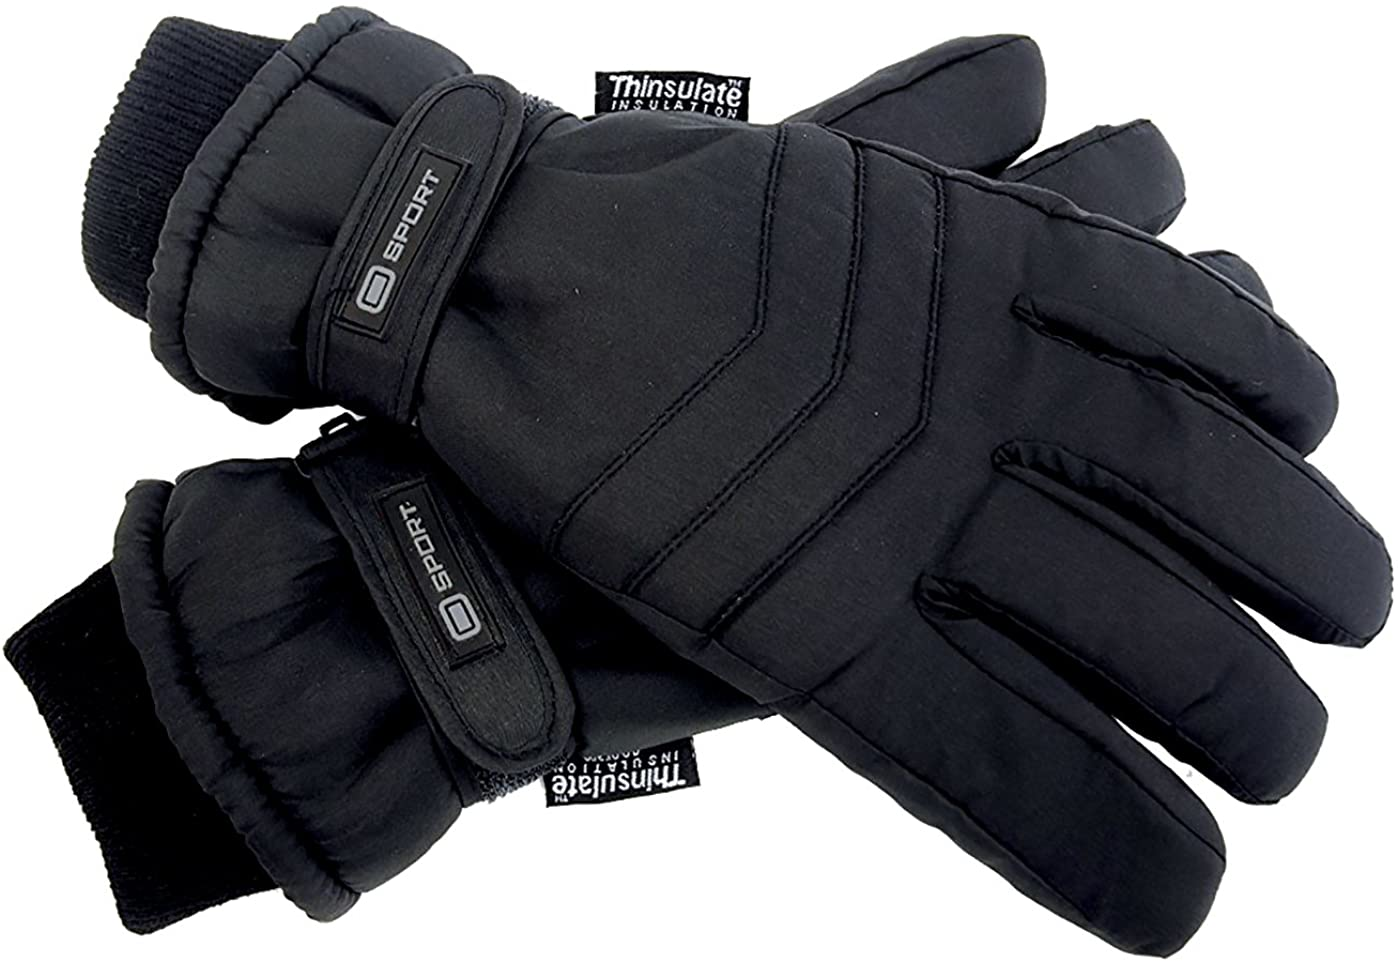 Mens 3M Thinsulate 40 gram Thermal Insulated Waterproof Warm Winter Ski Gloves